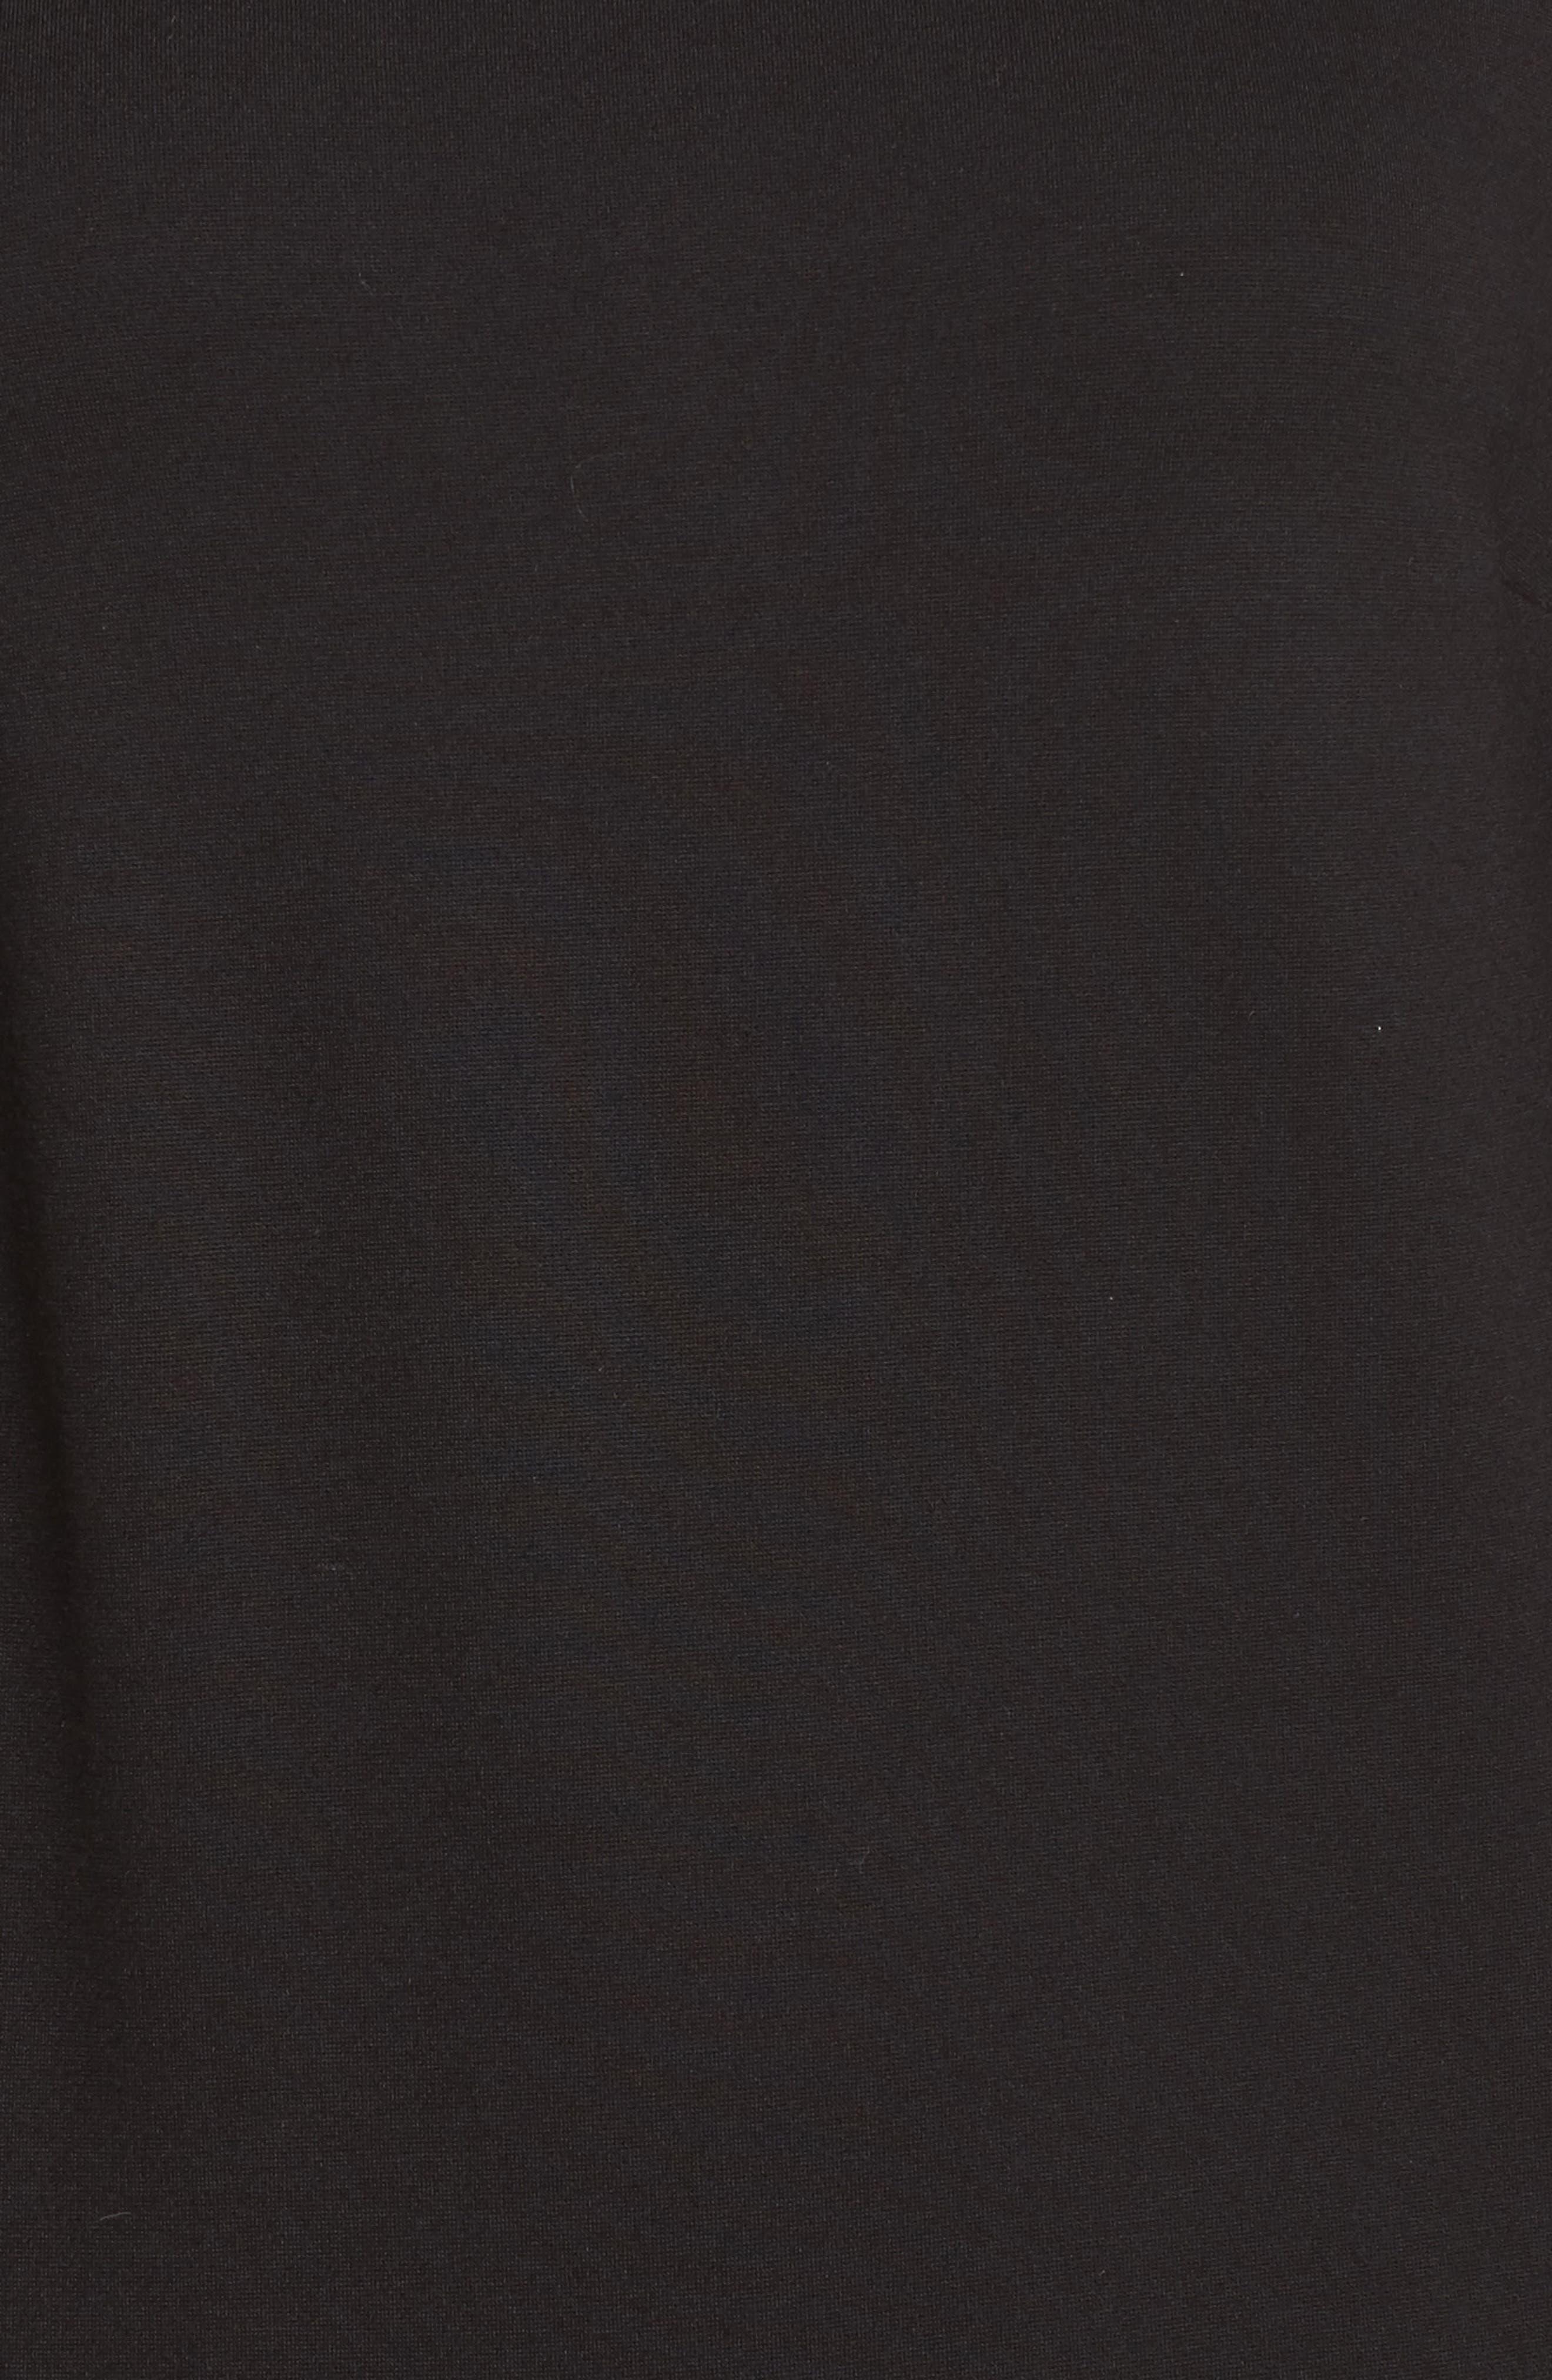 Matuku Lula Bell Sleeve Dress,                             Alternate thumbnail 5, color,                             001